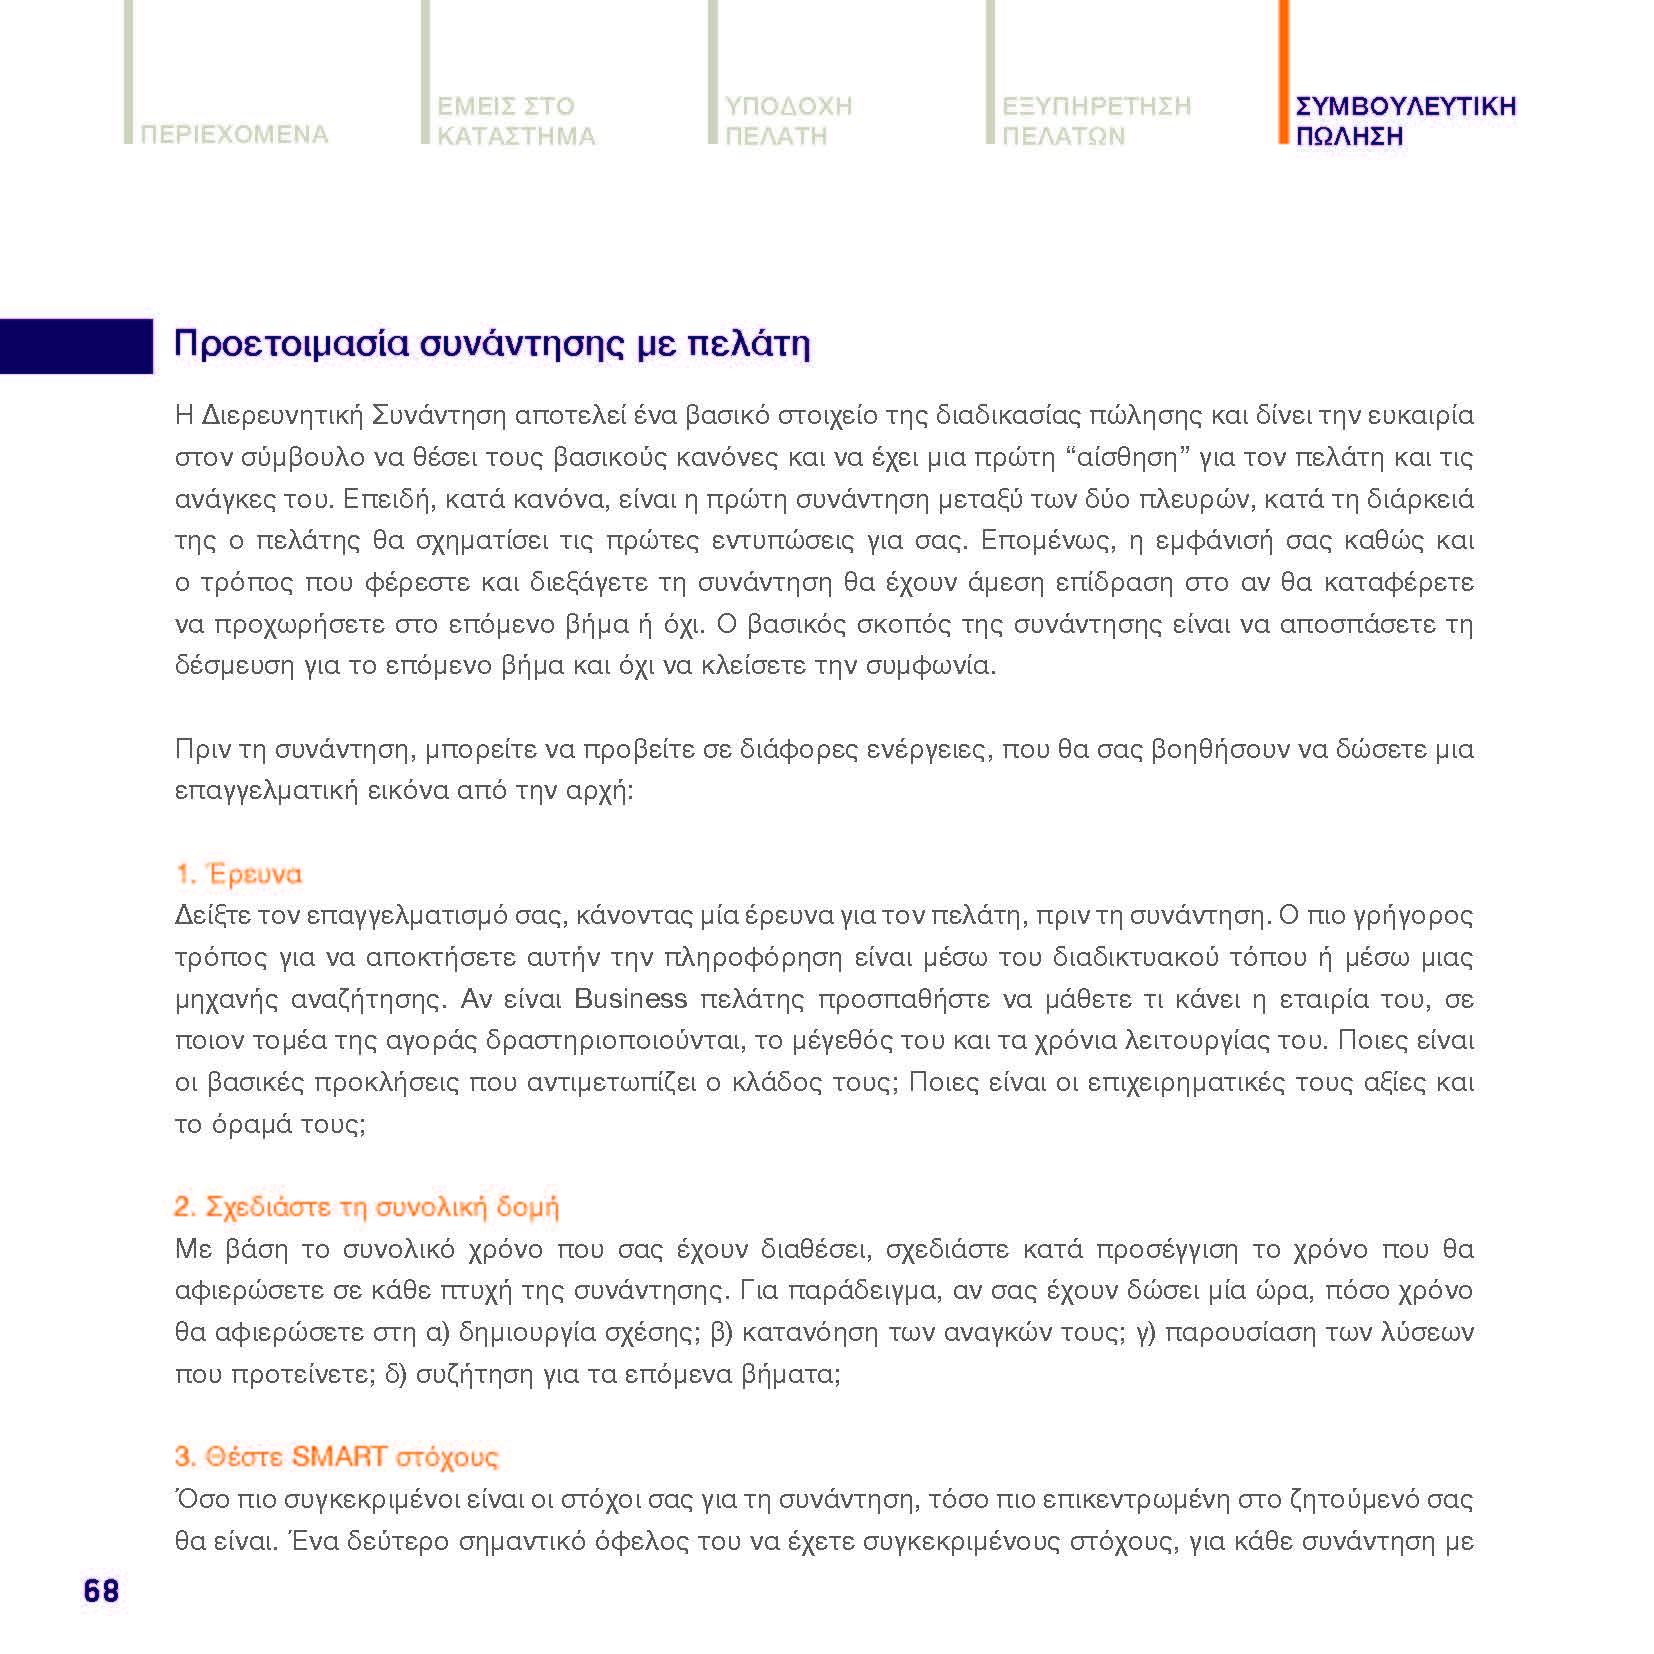 https://www.jib.gr/wp-content/uploads/2020/09/OPTIMA-BANK-BOOKLET-WEB_Page_068.jpg